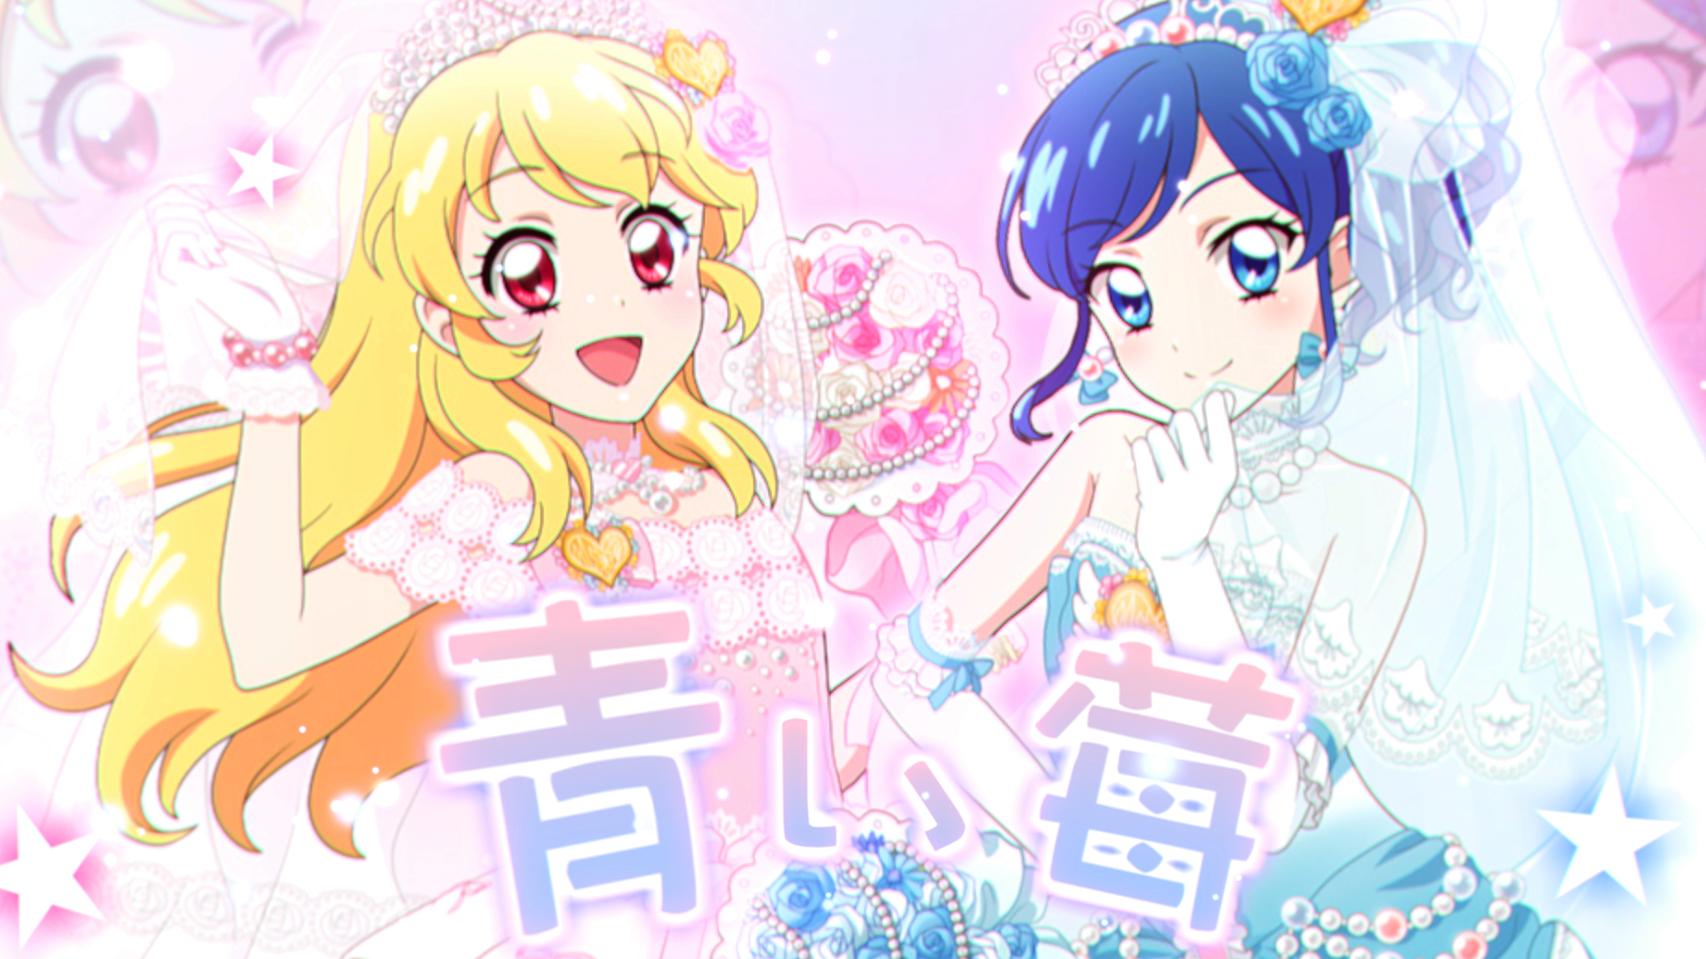 【Doki翻唱组】青い莓/青涩的草莓 【原MV付】